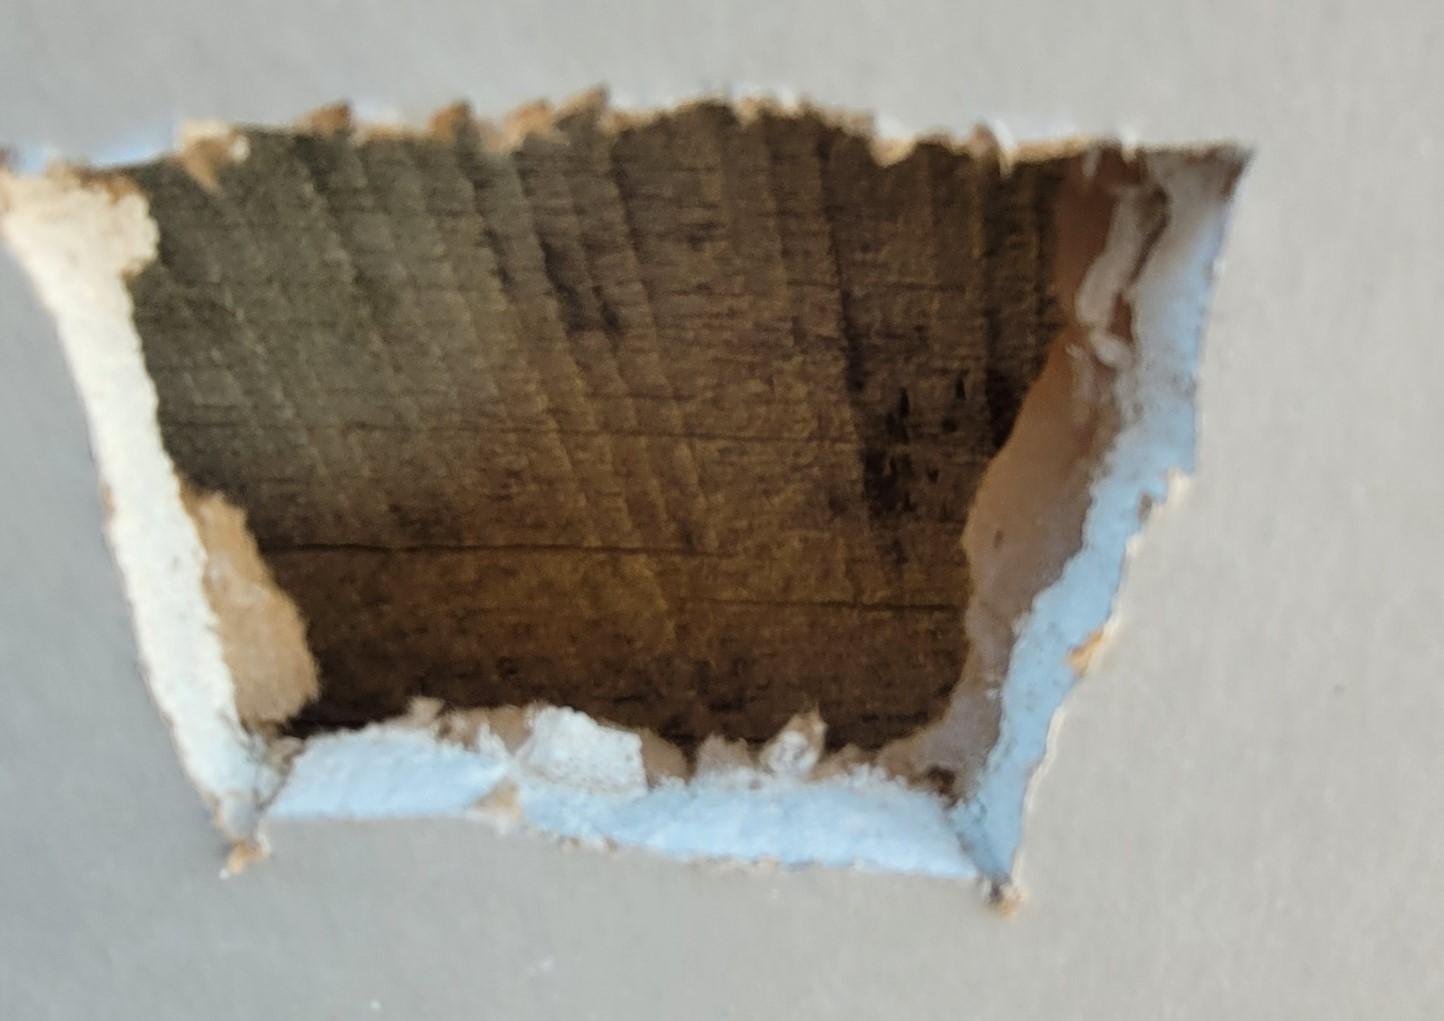 sheetrock repair hole gypsum wallboard